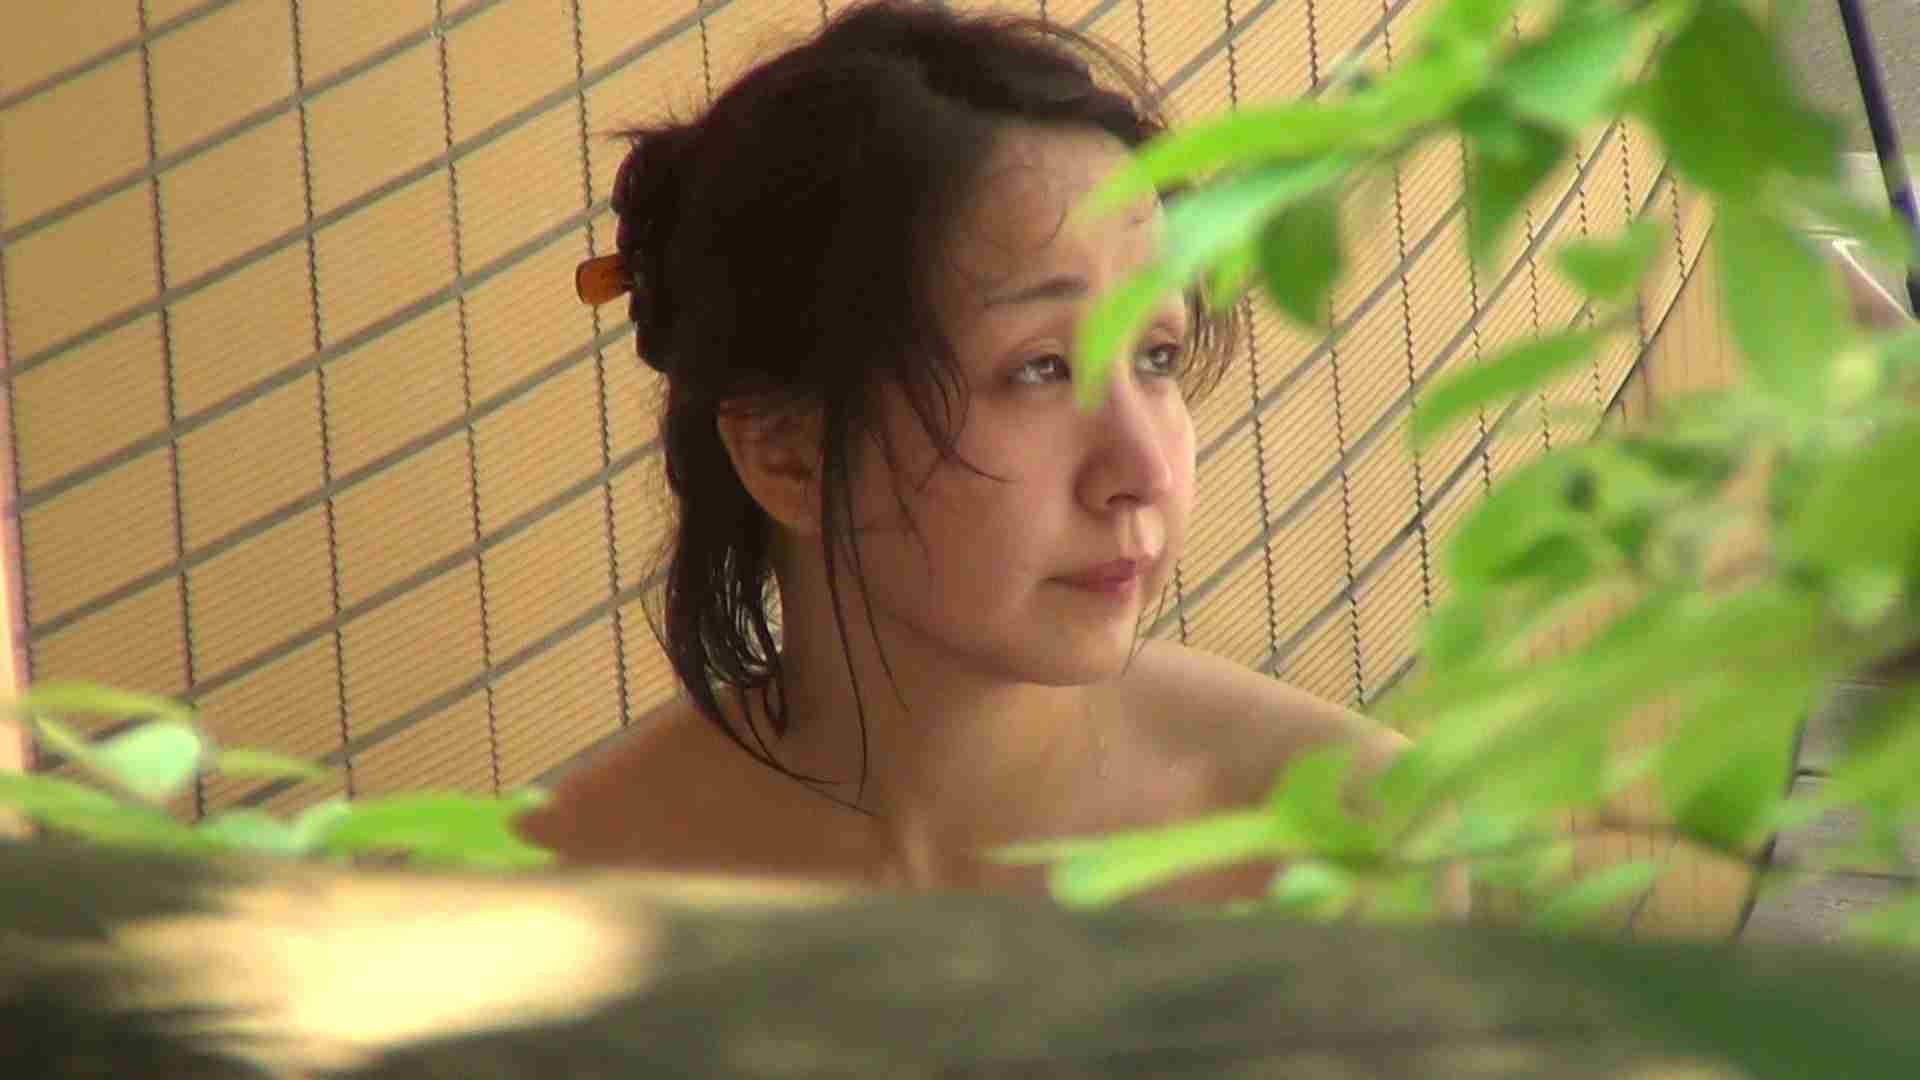 Aquaな露天風呂Vol.308 露天風呂編  95PIX 20